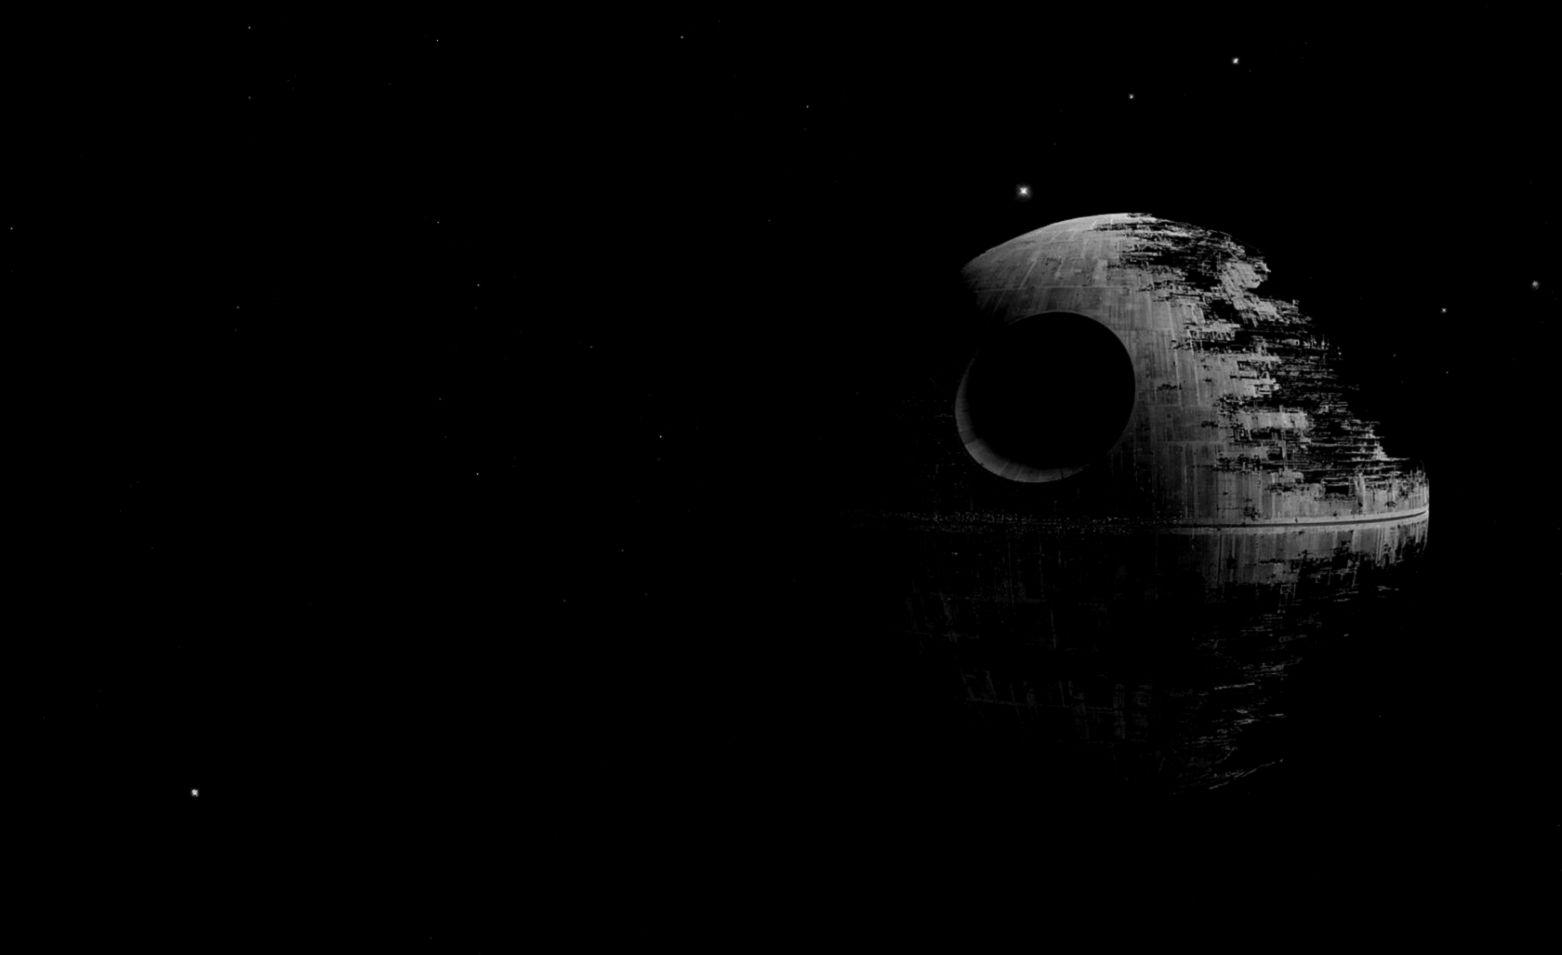 Star Wars Hd Wallpaper Wallpapers Quality